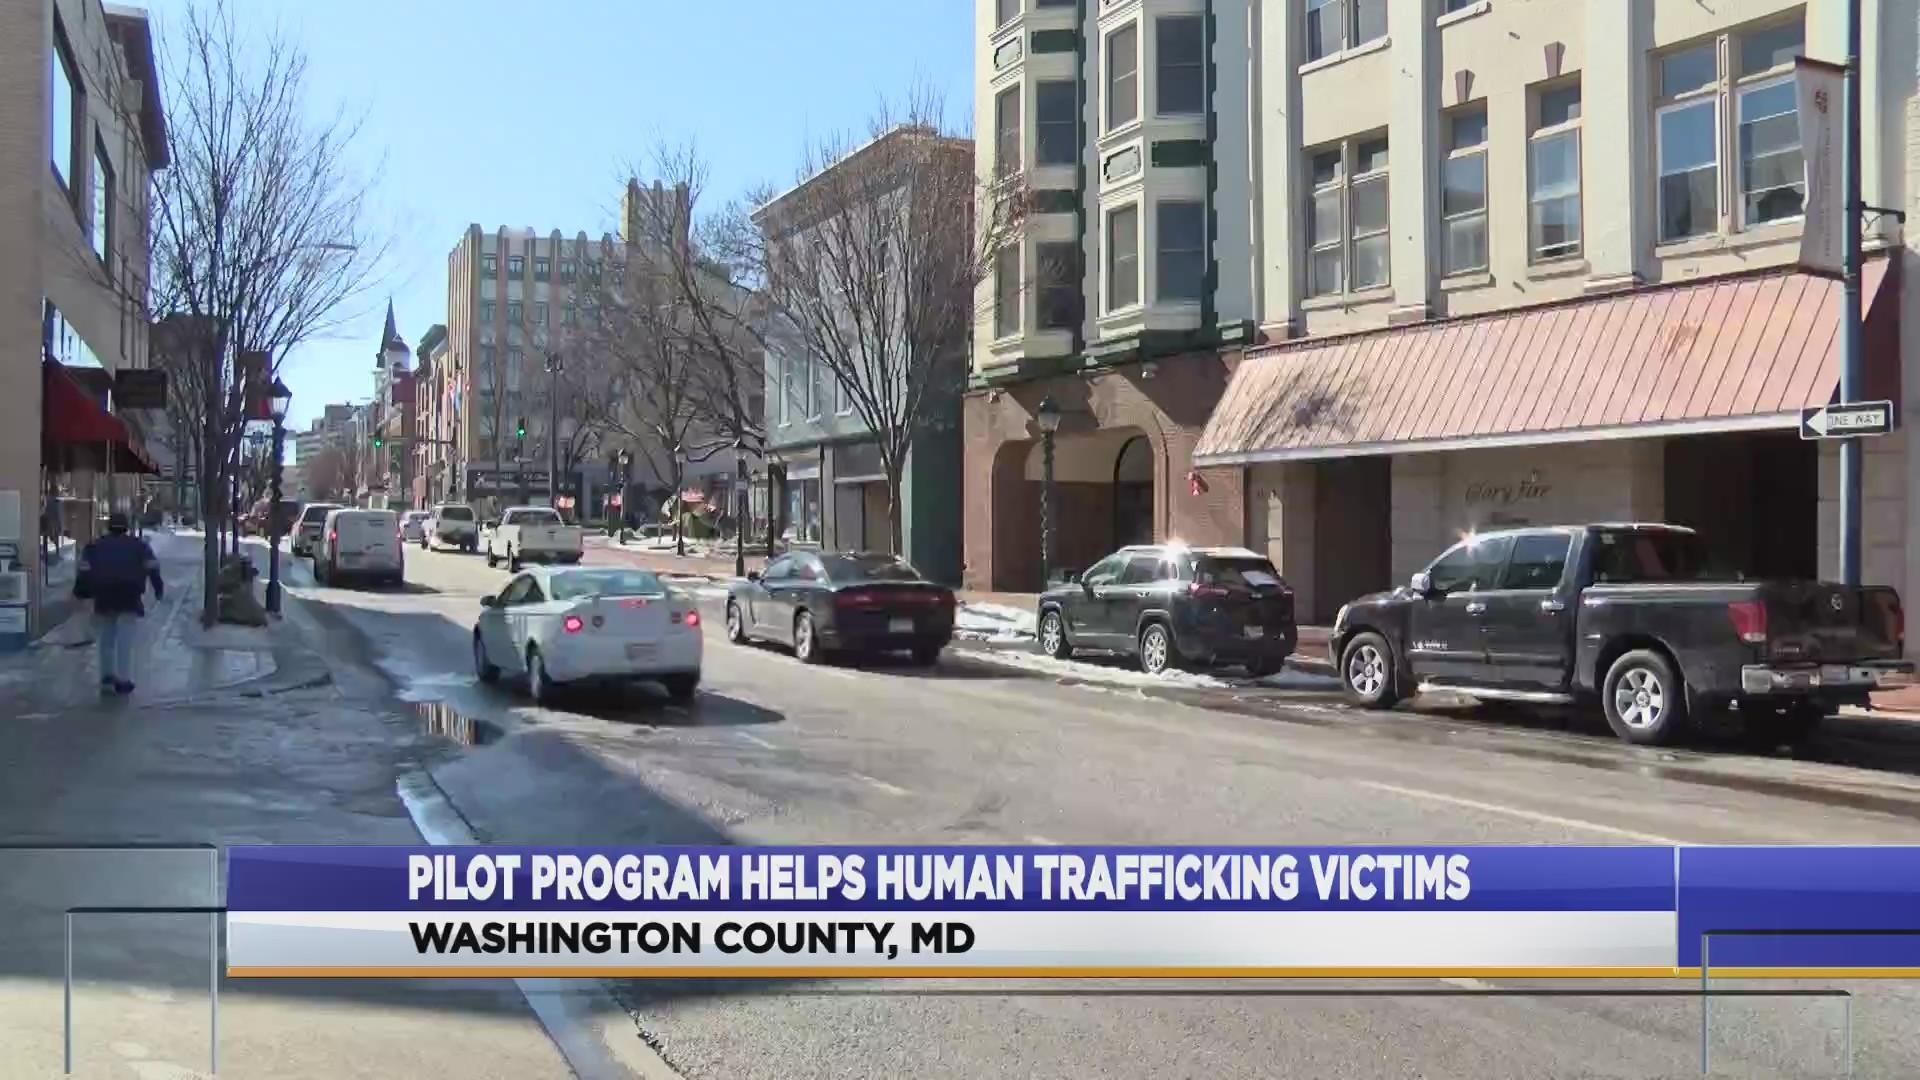 Human_Trafficking_in_Washington_County_0_20180207002242